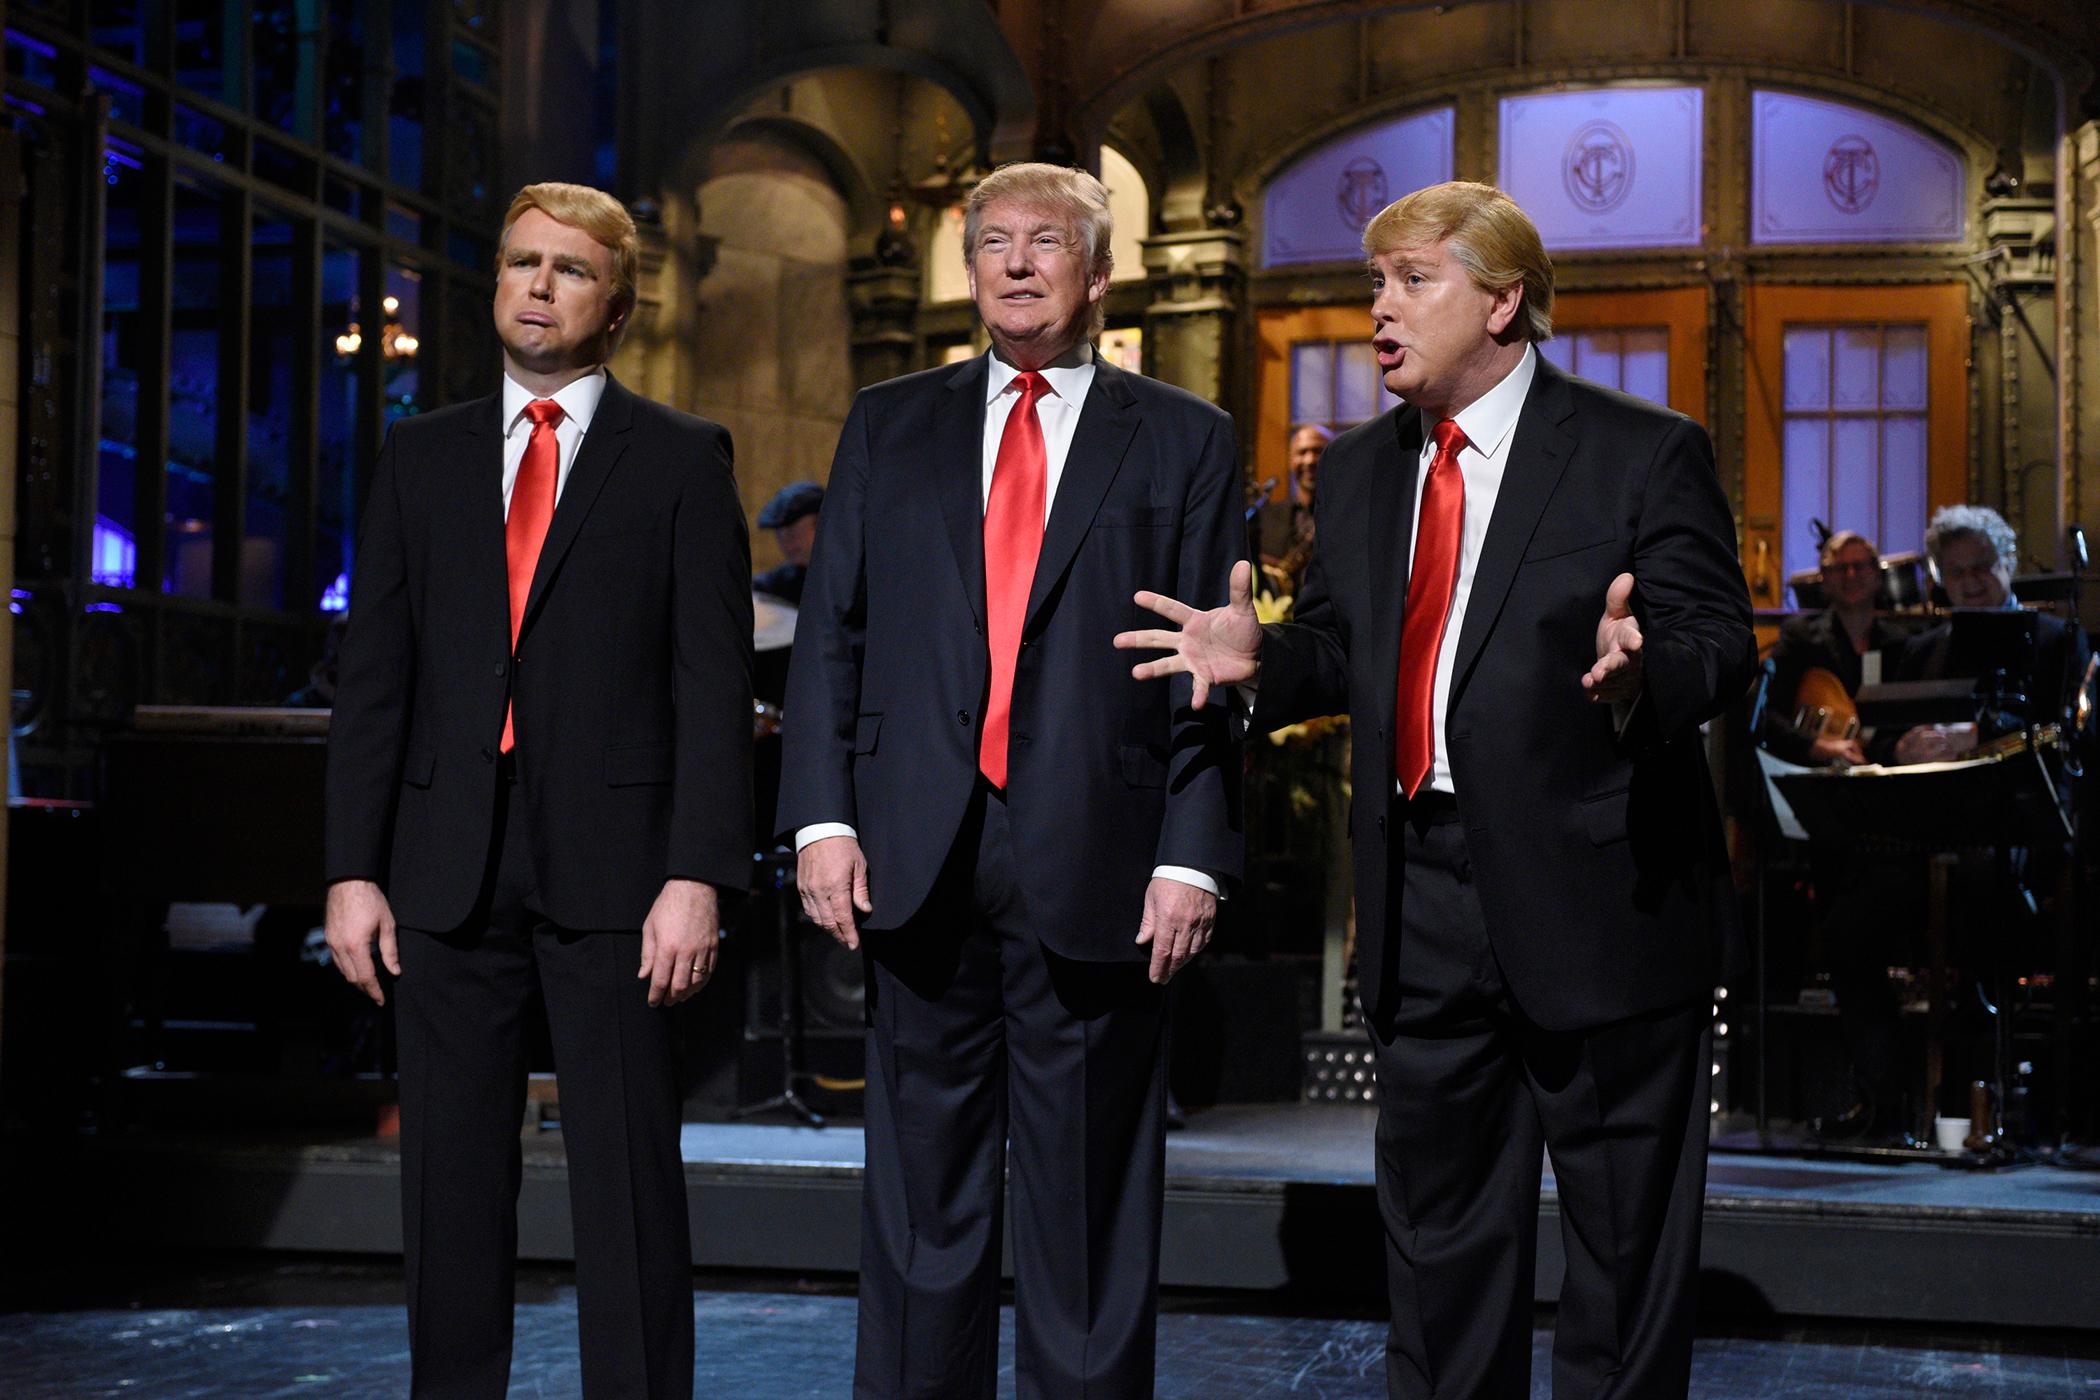 Saturday Night Live  Donald Trump  Episode with (l-r) Taran Killam, Donald Trump, and Darrell Hammond during the monologue on November 7, 2015.